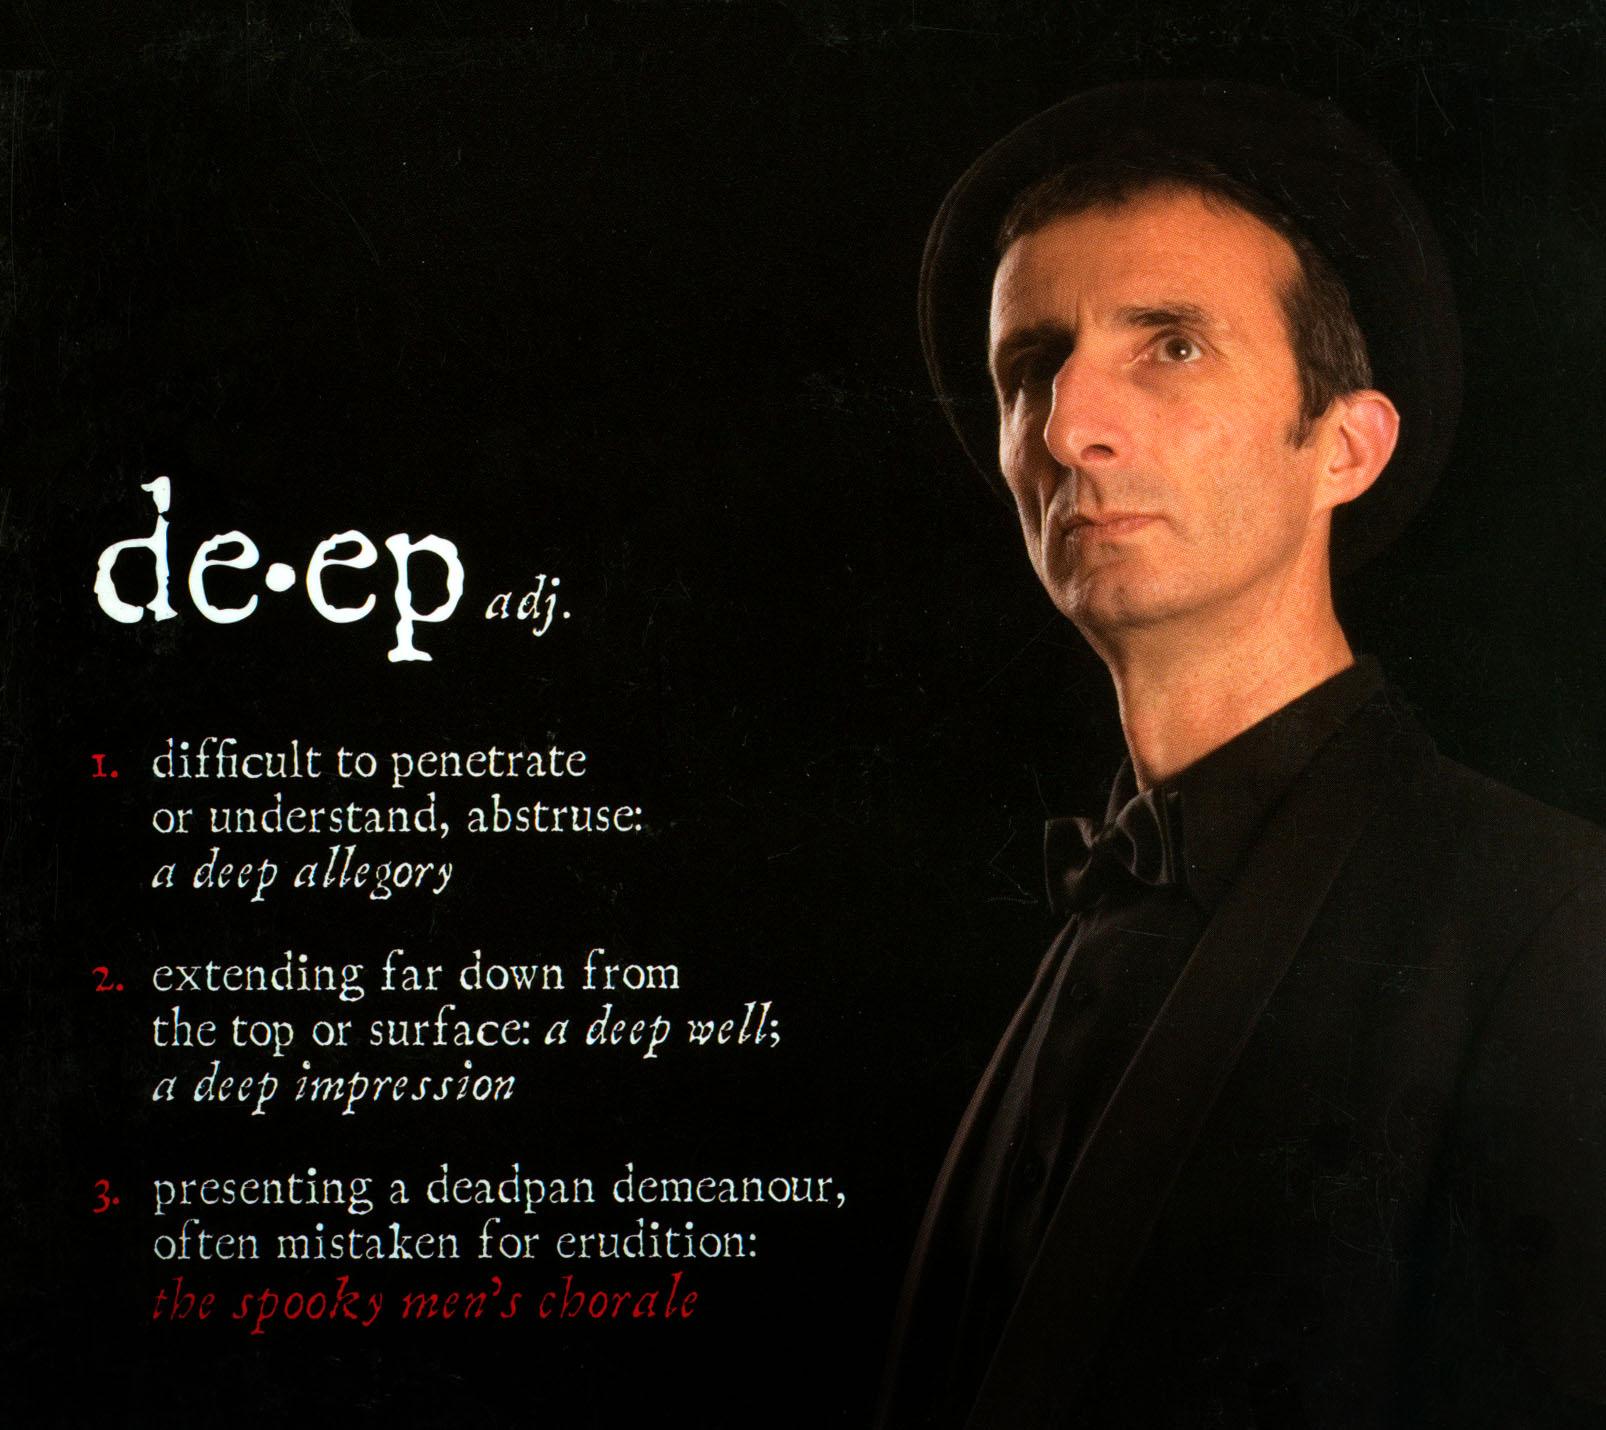 The Spooky Men's Chorale: Deep